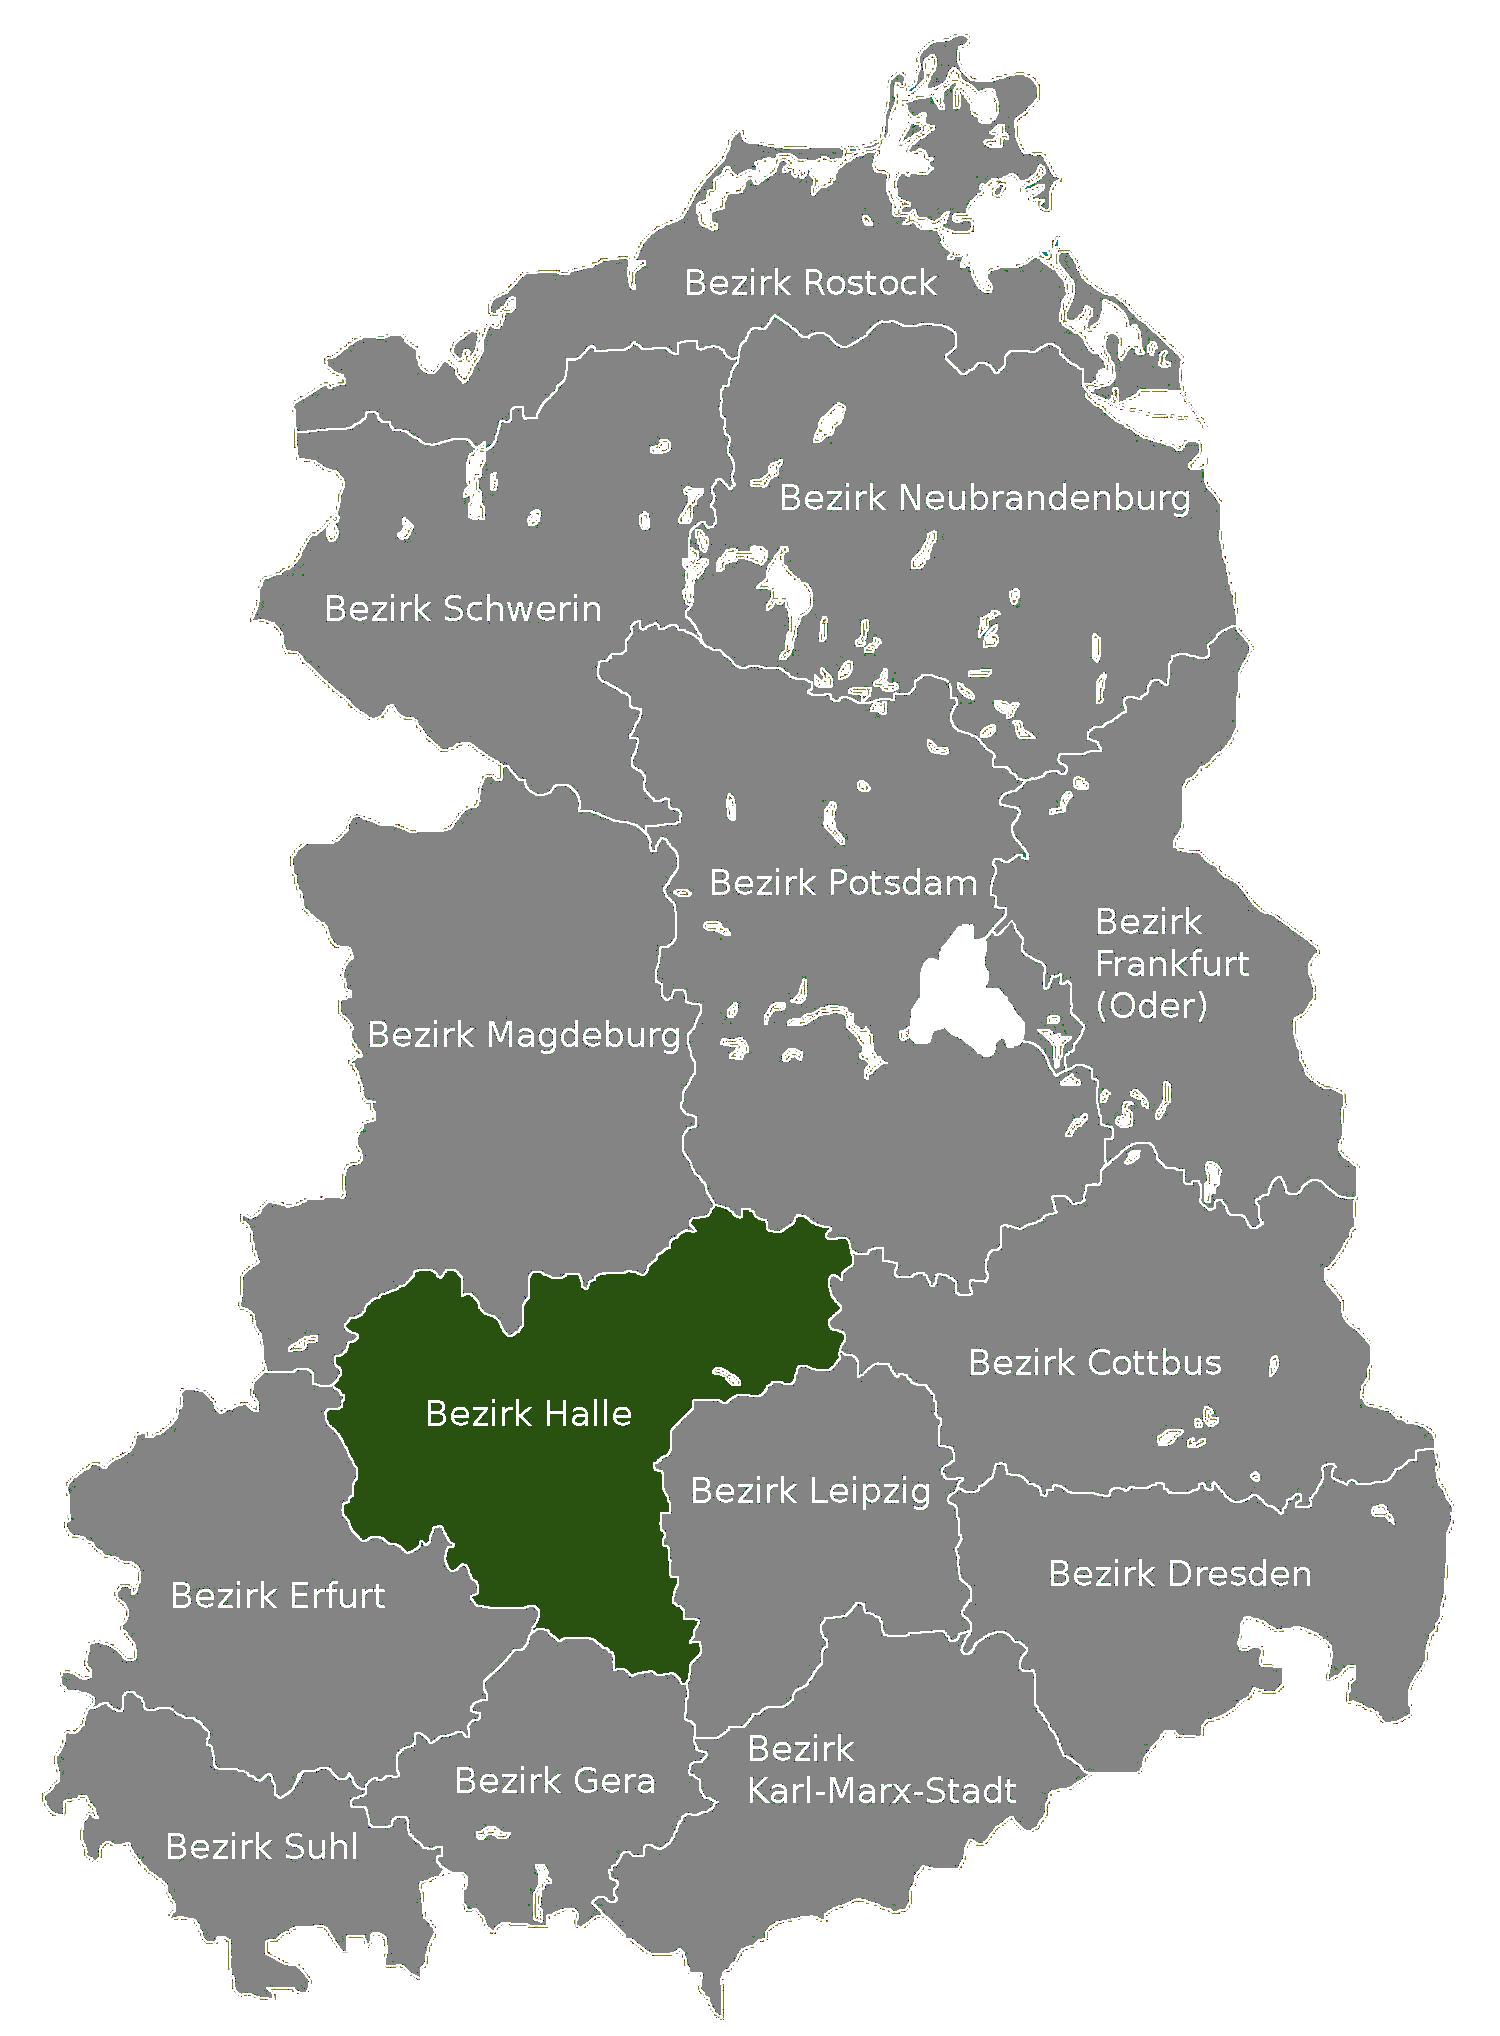 Halle (Bezirk)